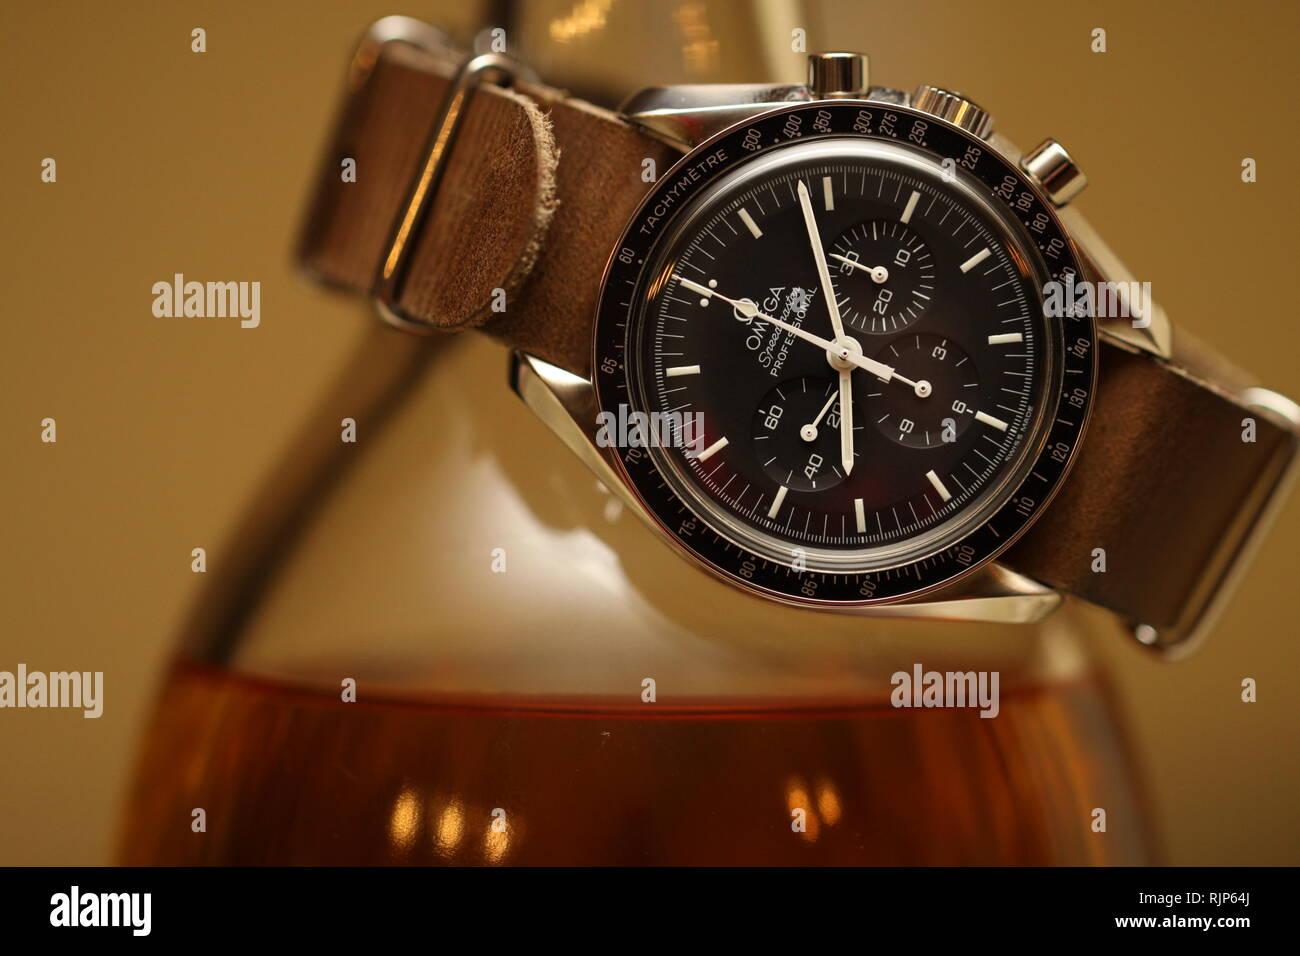 Omega Speedmaster watch on leather nato strap wrapped around bottle of single malt scotch on brown background Stock Photo